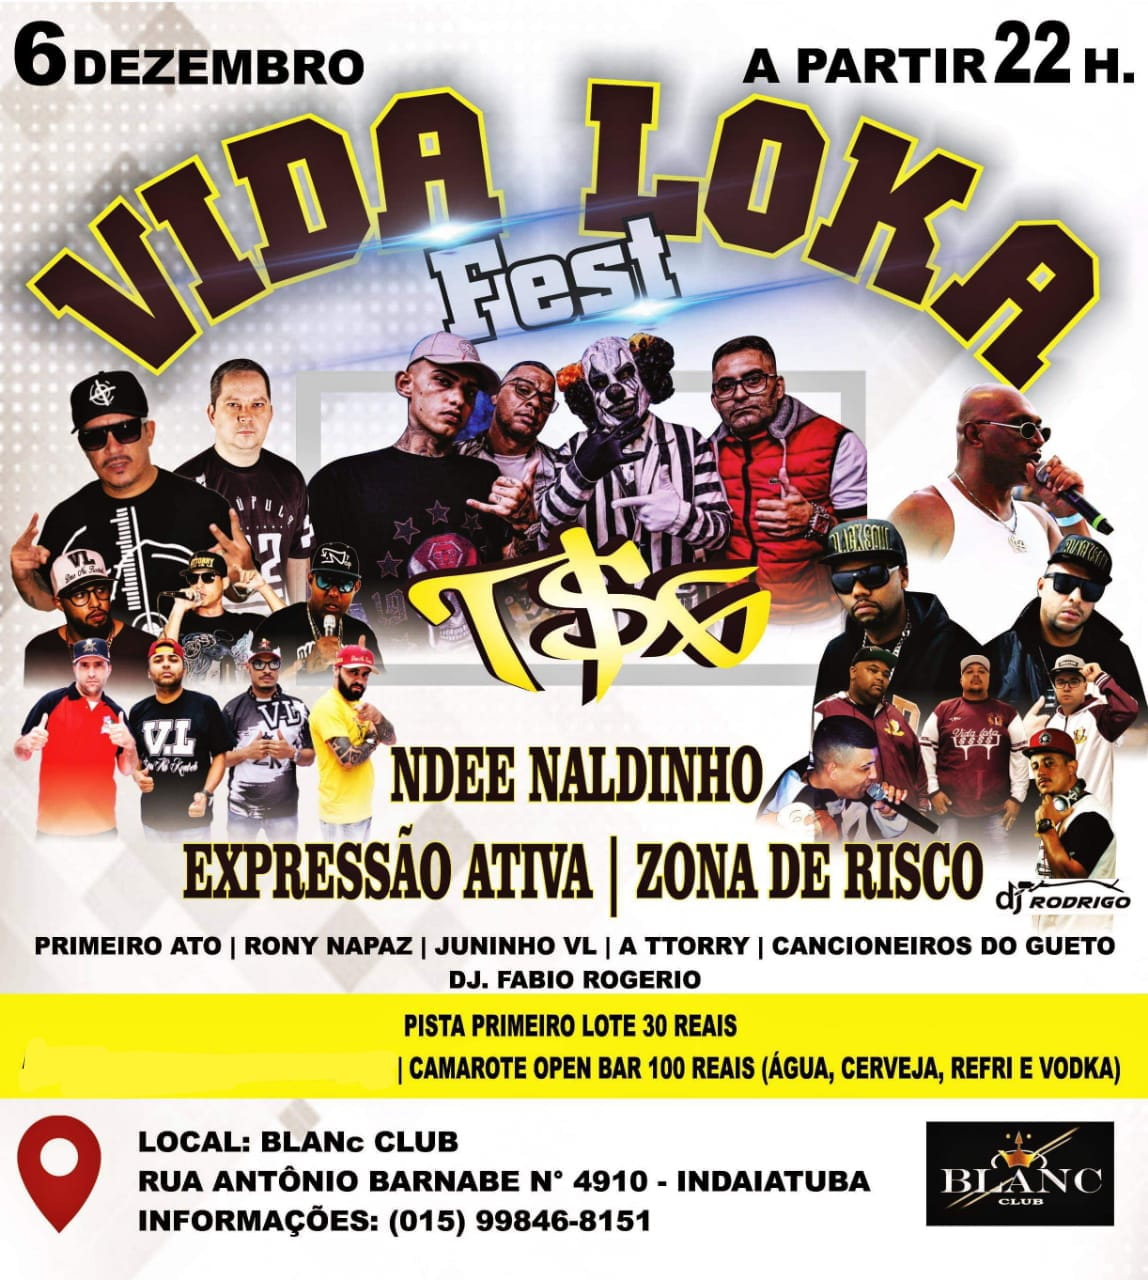 Vida Loka Fest - 06/12/19 - Indaiatuba - SP